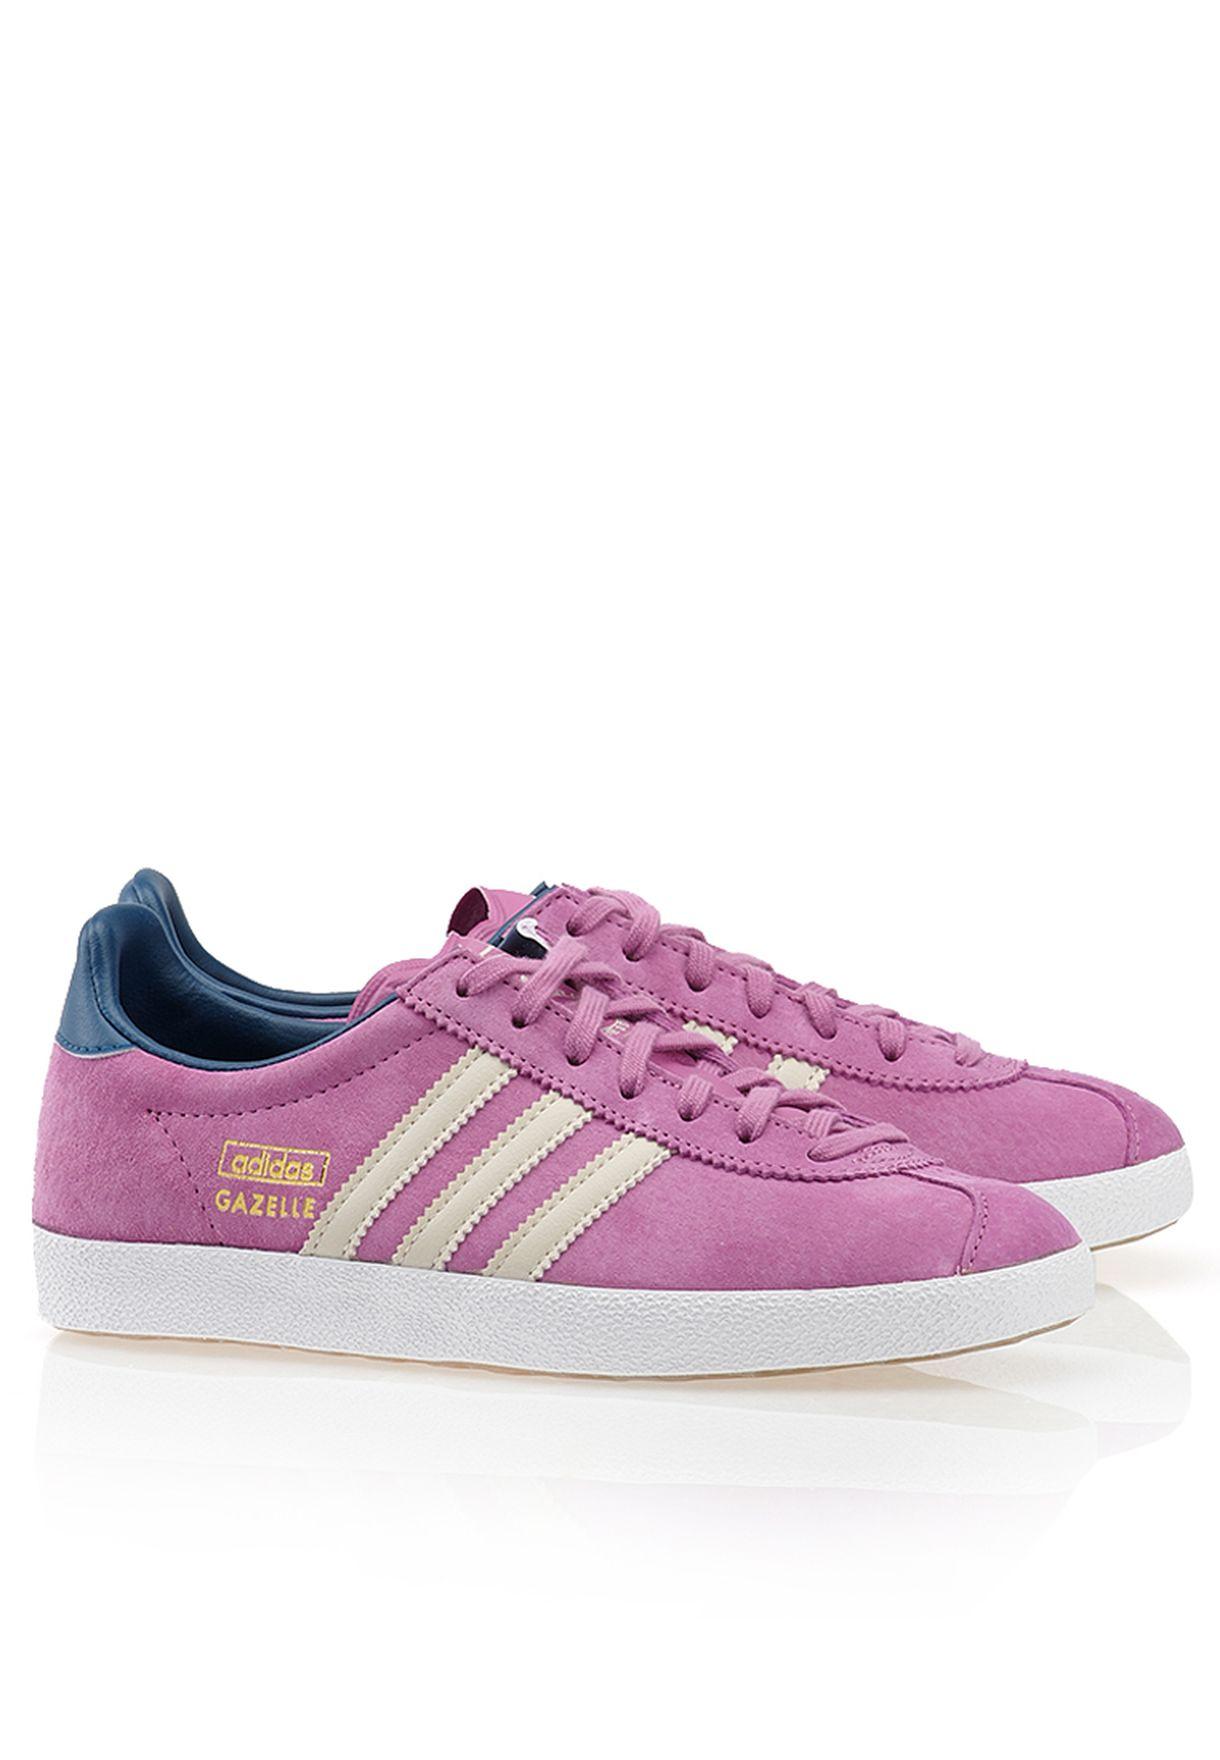 558d4f1b94b Shop adidas Originals purple Gazelle OG Sneakers D67855 for Women in ...